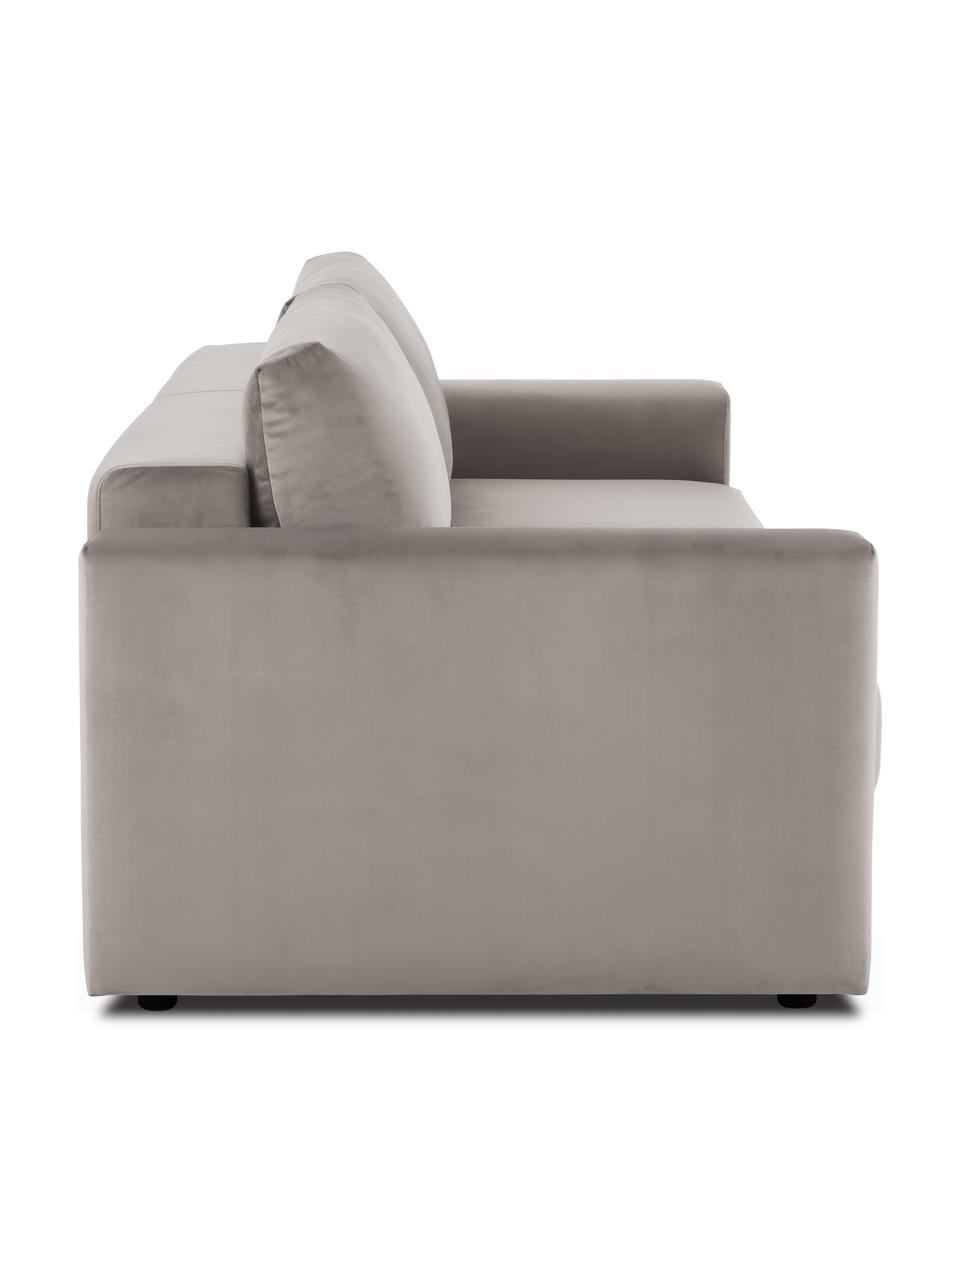 Fluwelen slaapbank Tasha in taupe, Bekleding: fluweel (100% polyester), Frame: massief grenenhout, multi, Poten: kunststof, Fluweel beige, 235 x 100 cm